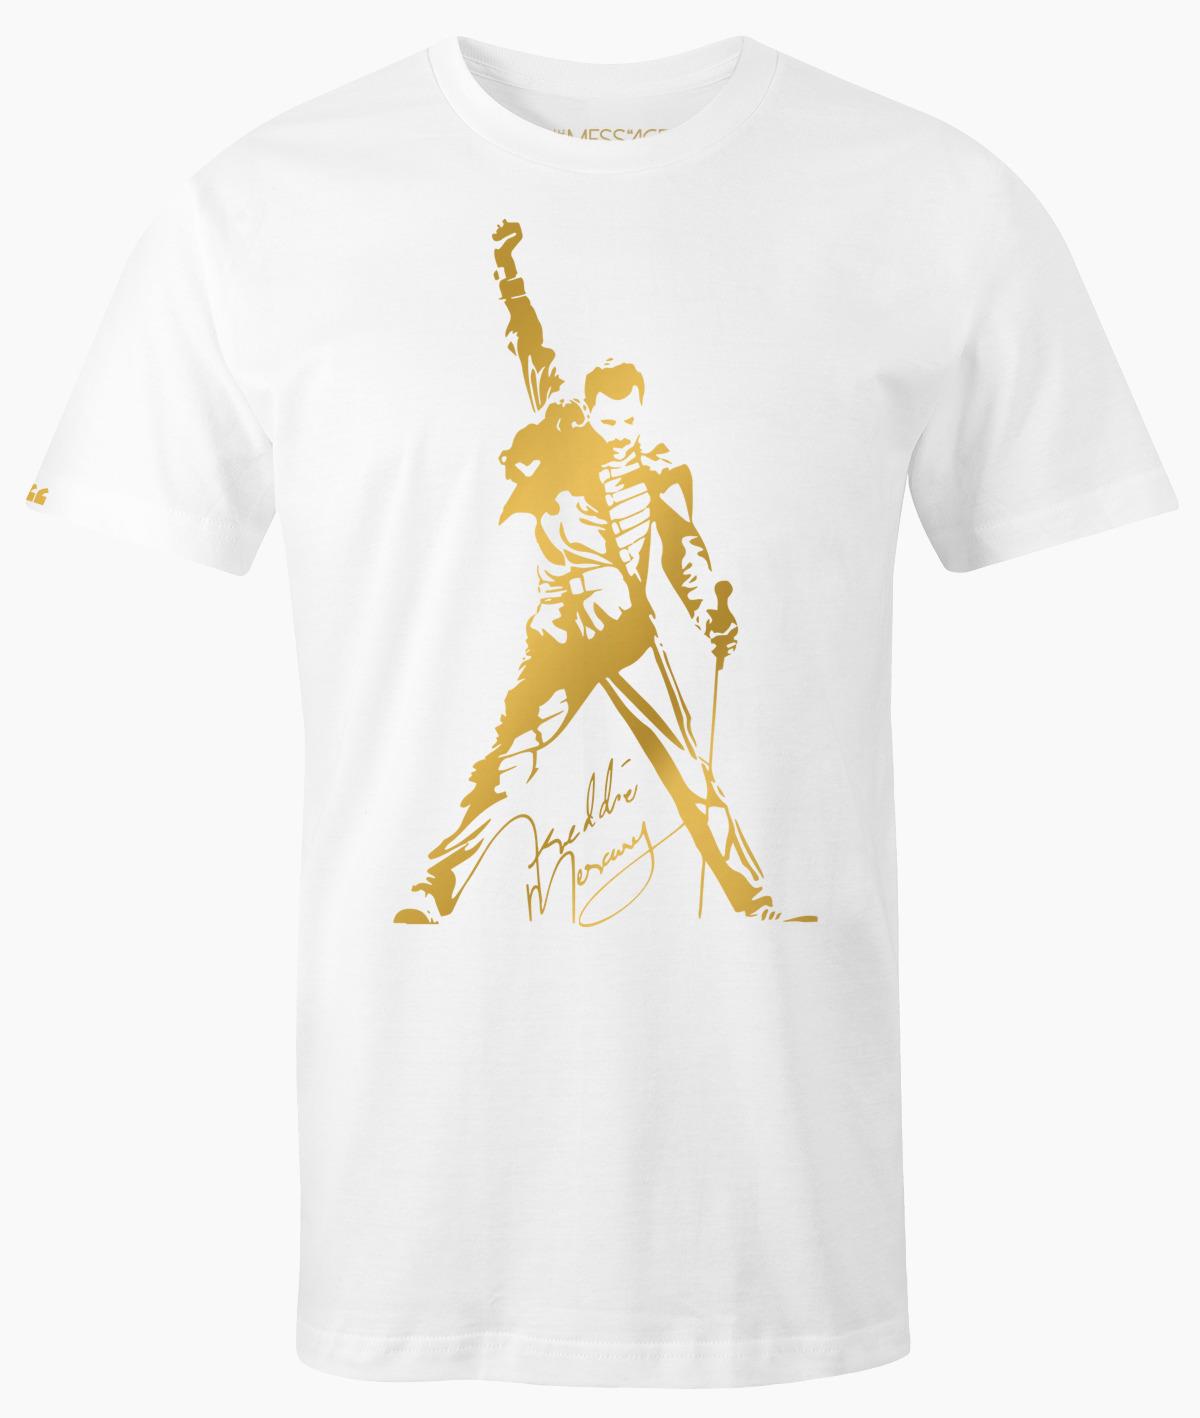 We Will Rock You – Freddie Mercury T-Shirt